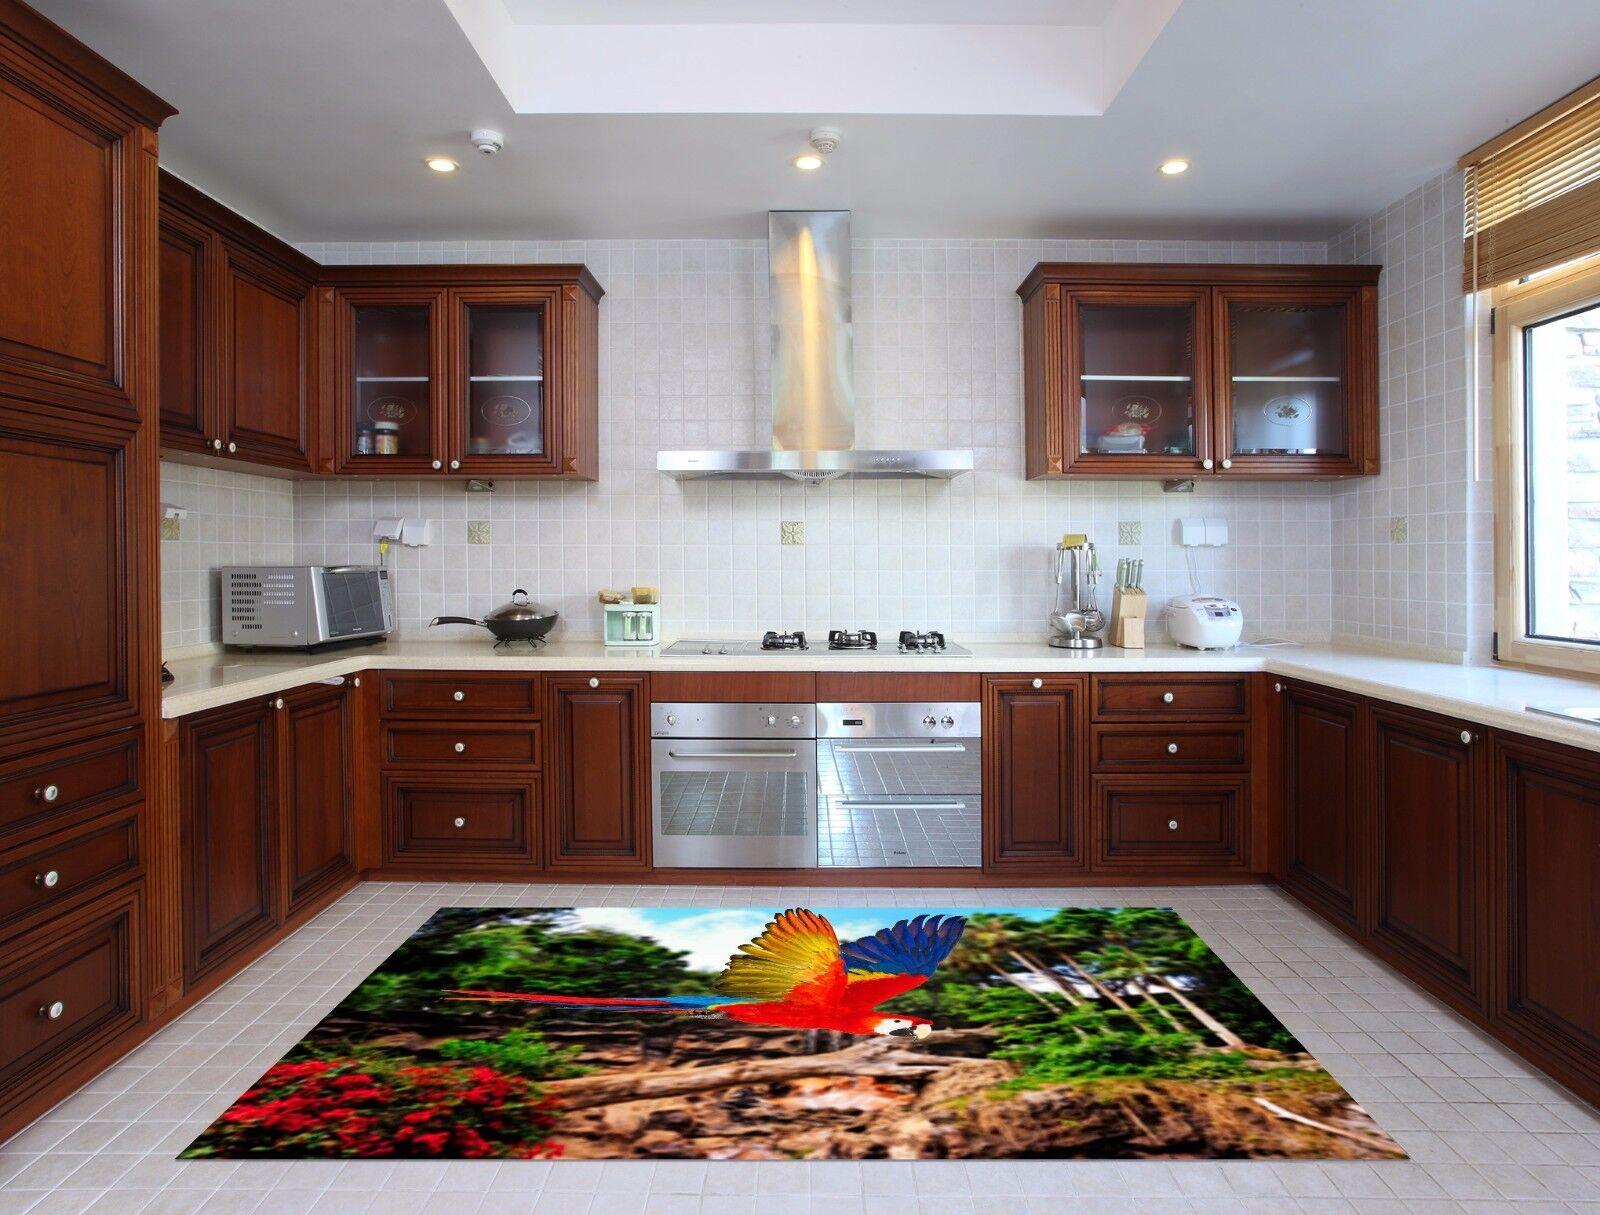 3D Stone Parrot 89 Kitchen Mat Floor Murals Wall Print Wall AJ WALLPAPER UK Kyra